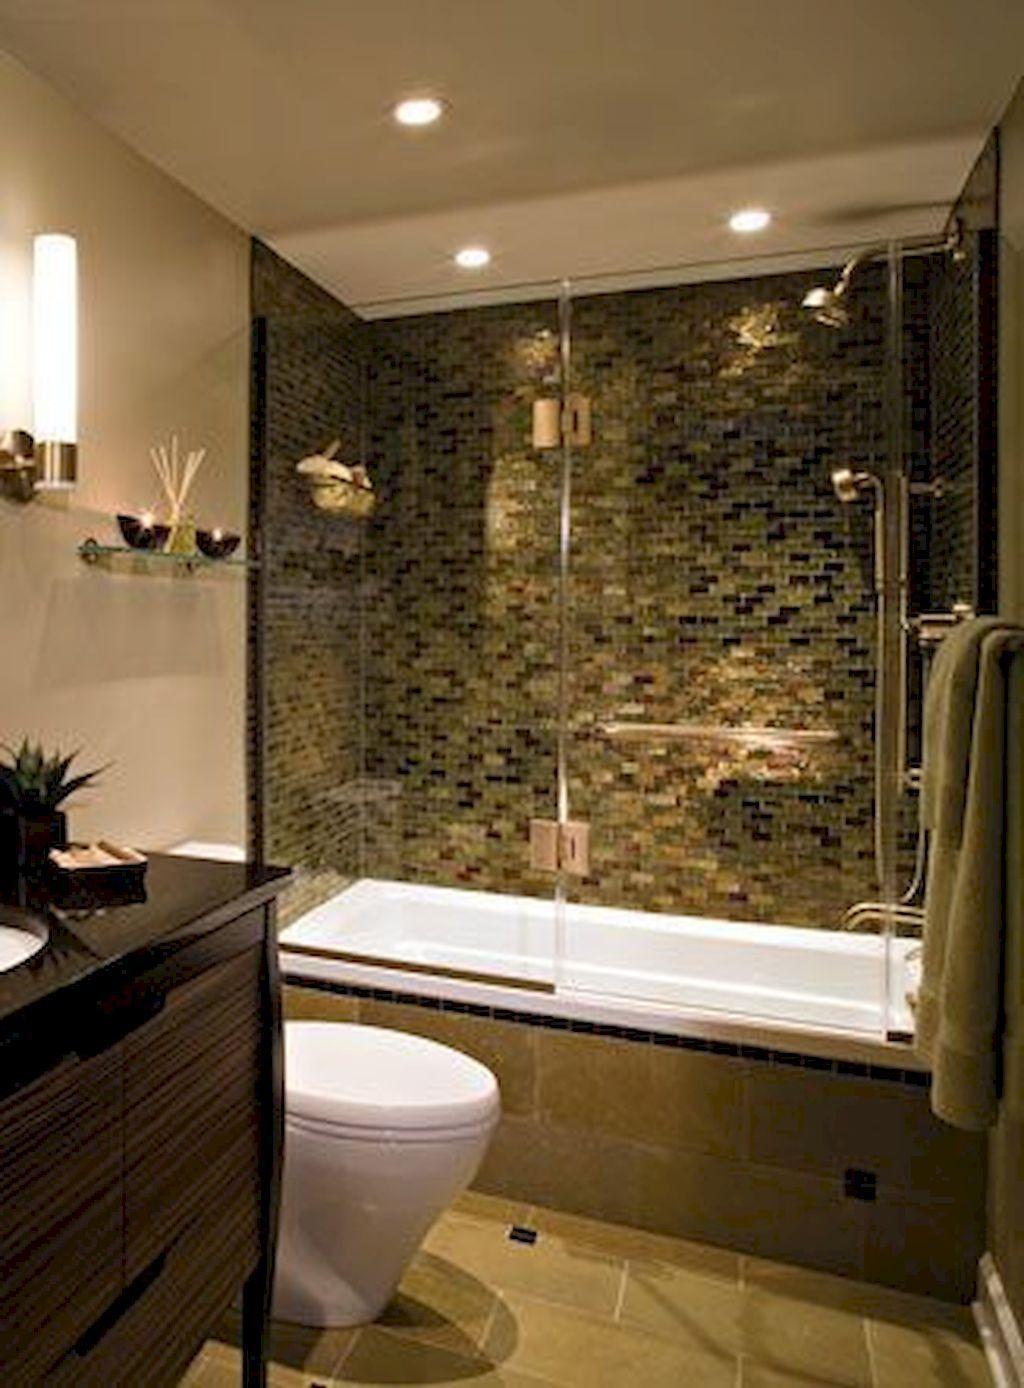 Smart Bathroom Decor Ideas On A Budget 10 Condo Bathroom Bathroom Remodel Cost Basement Bathroom Remodeling